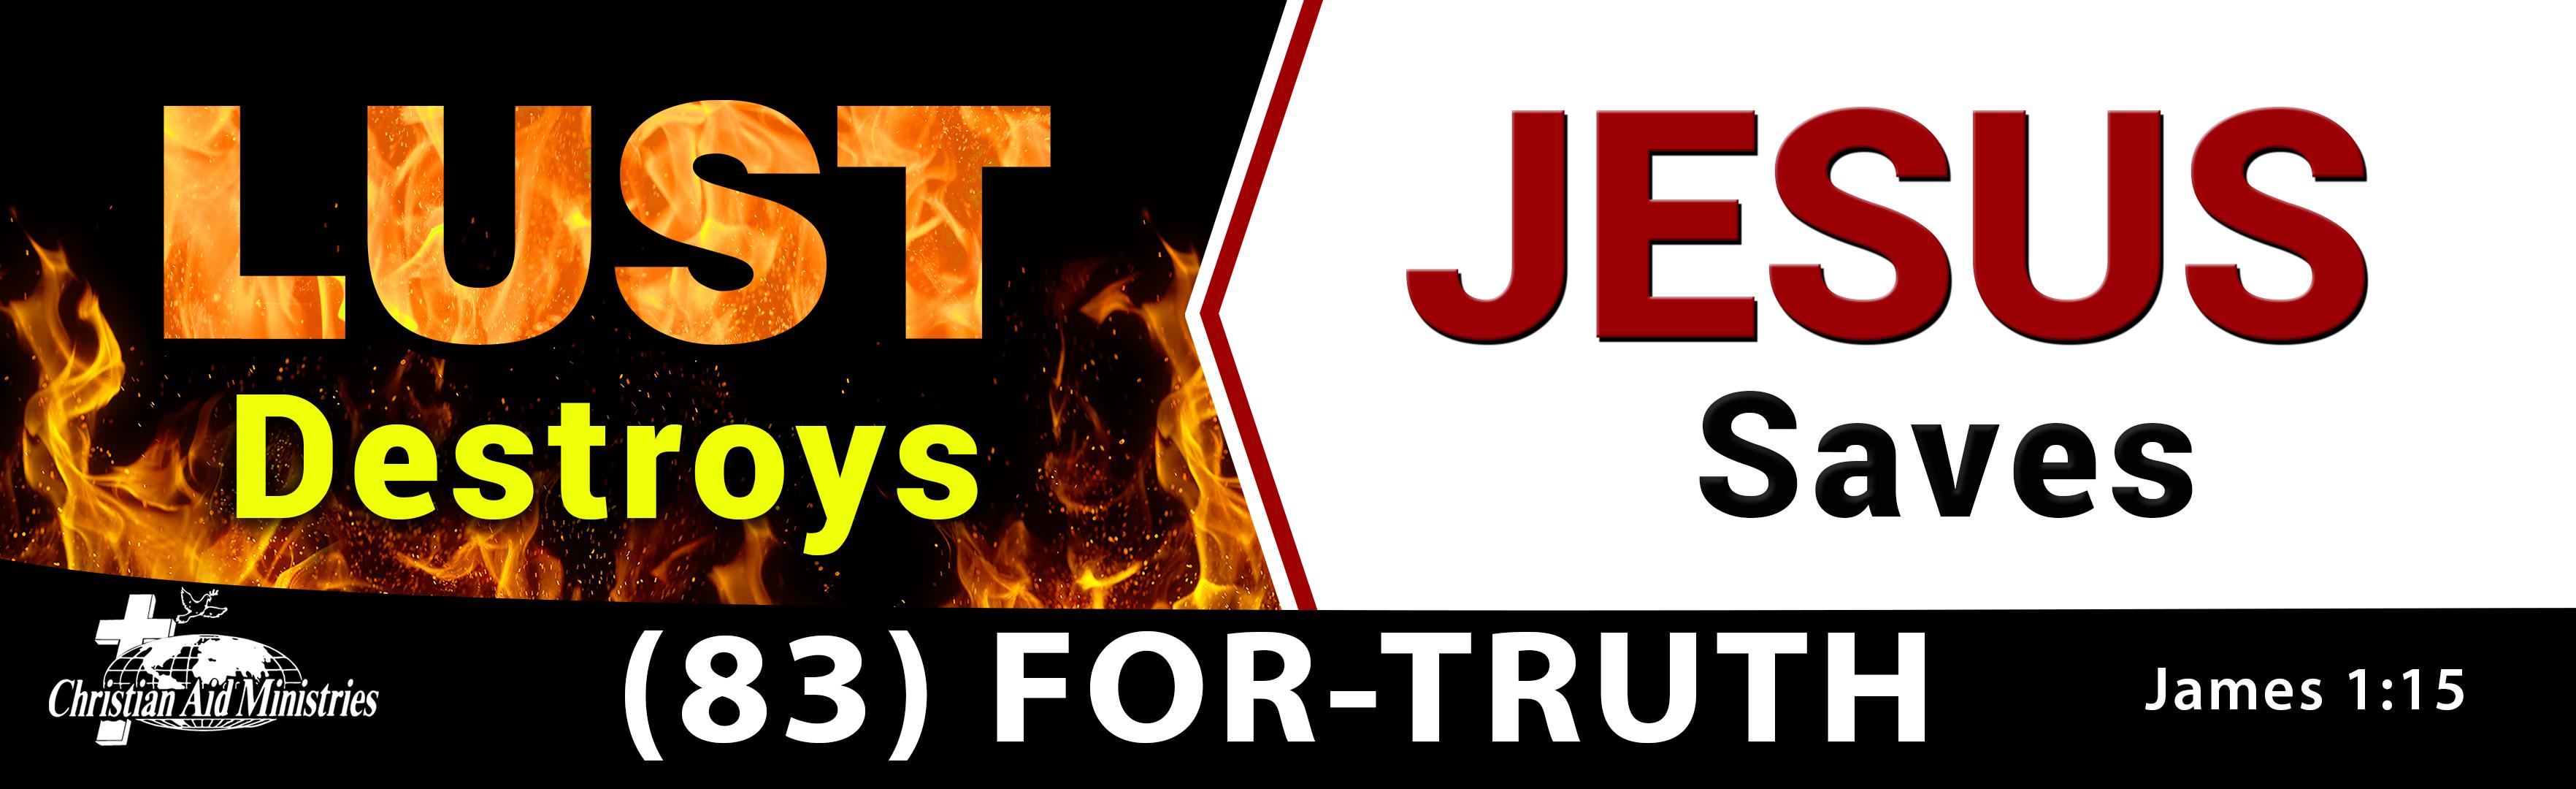 Lust destroys, Jesus Saves